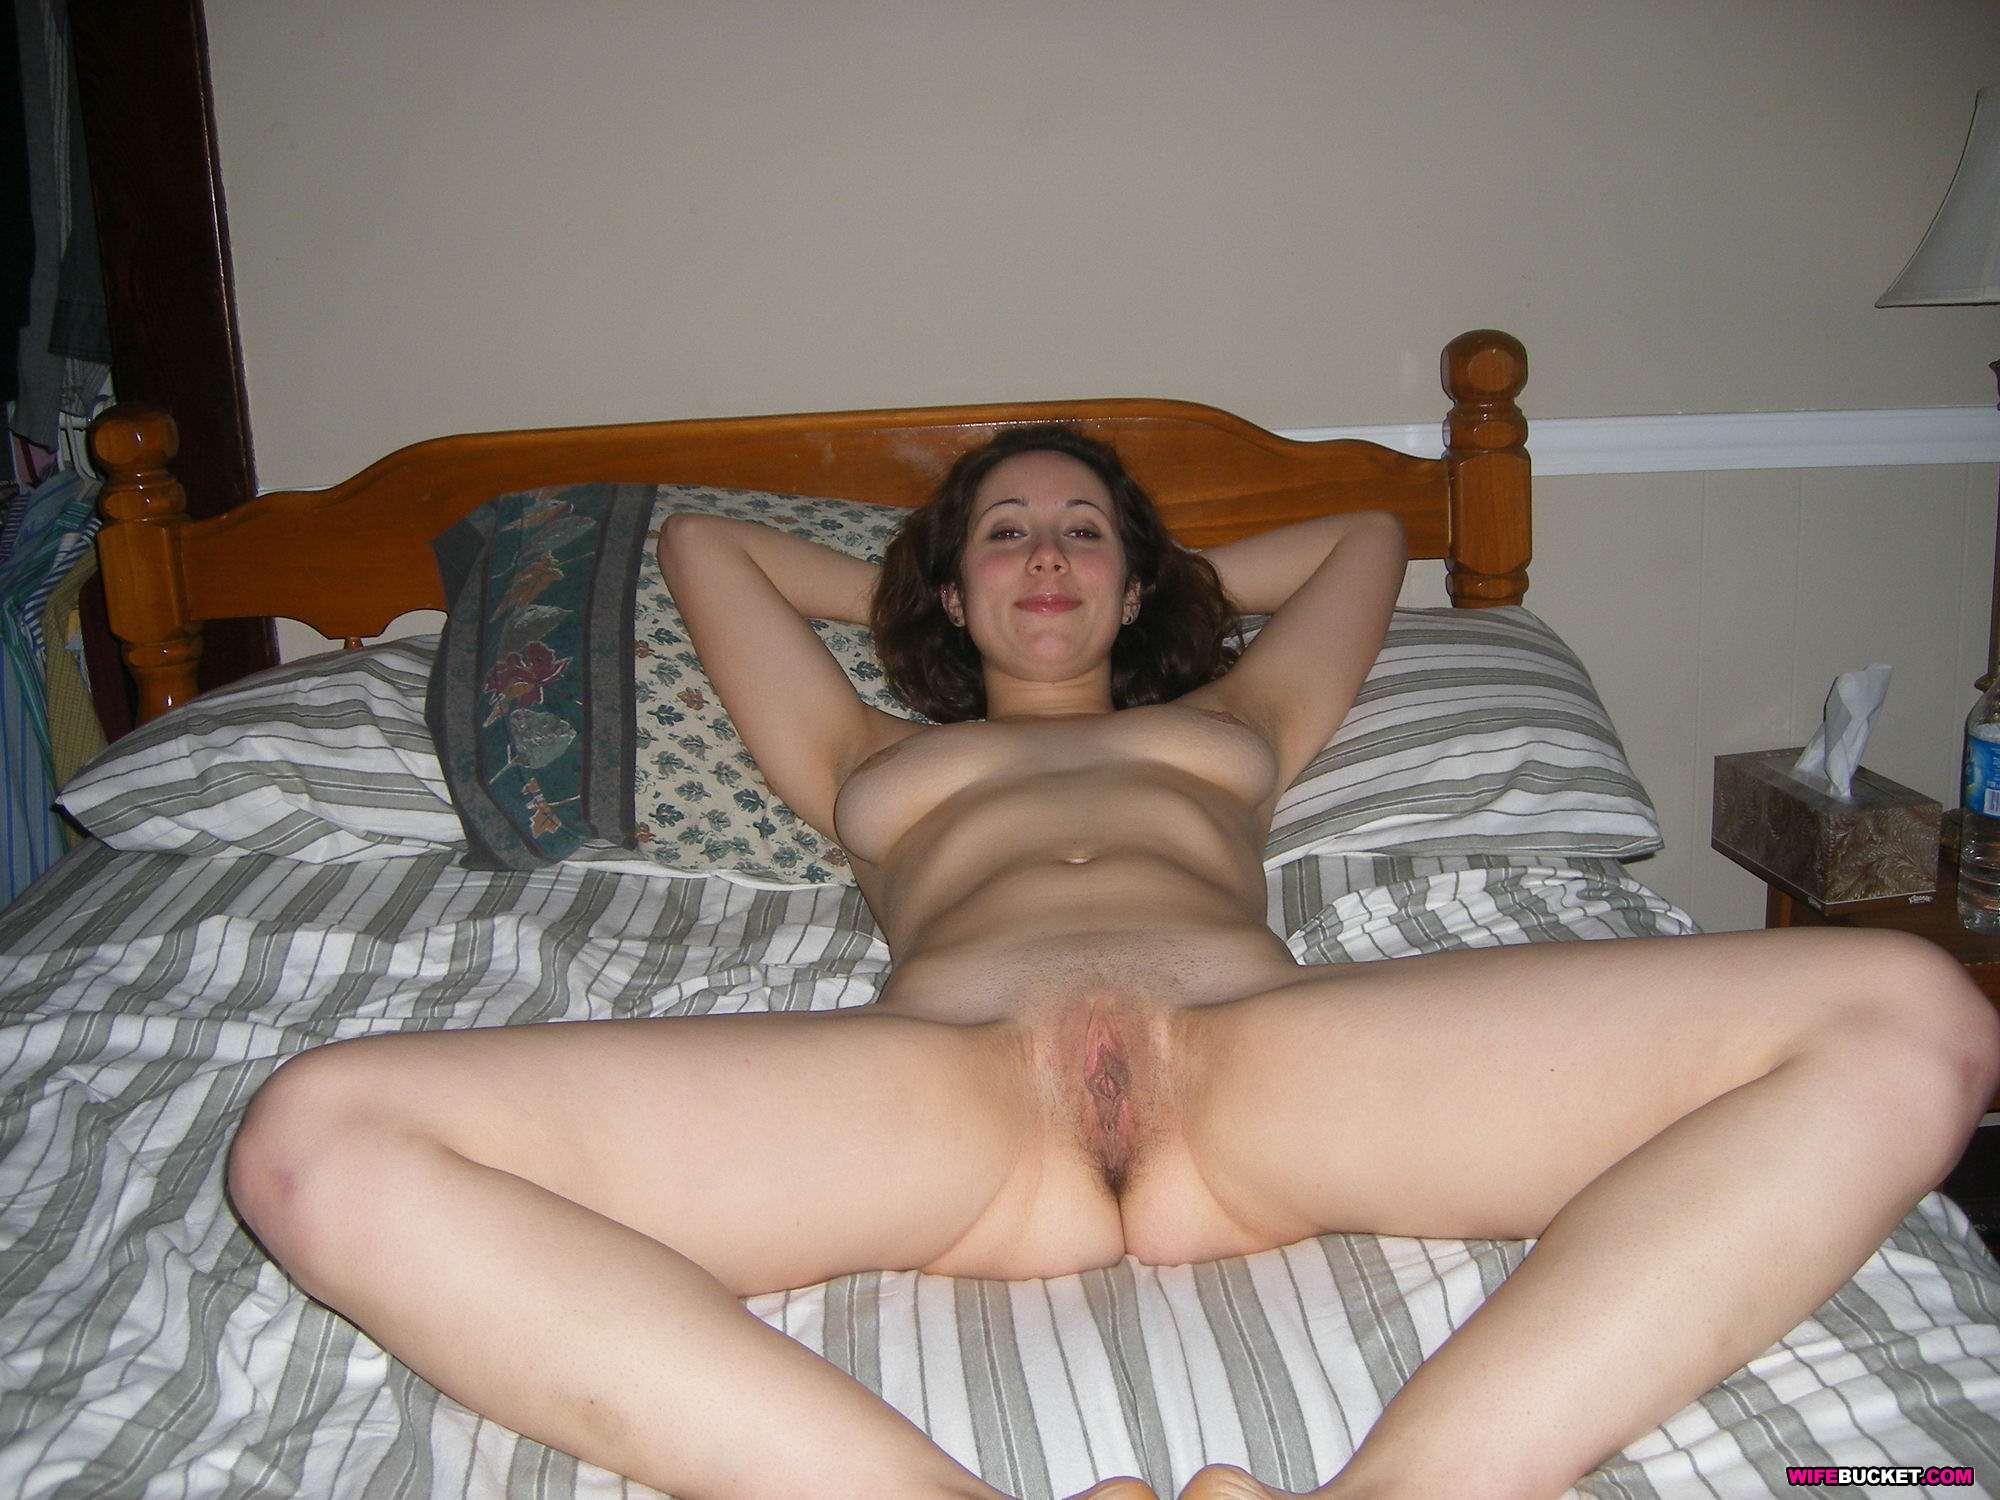 naked girls in stockings fucking condom